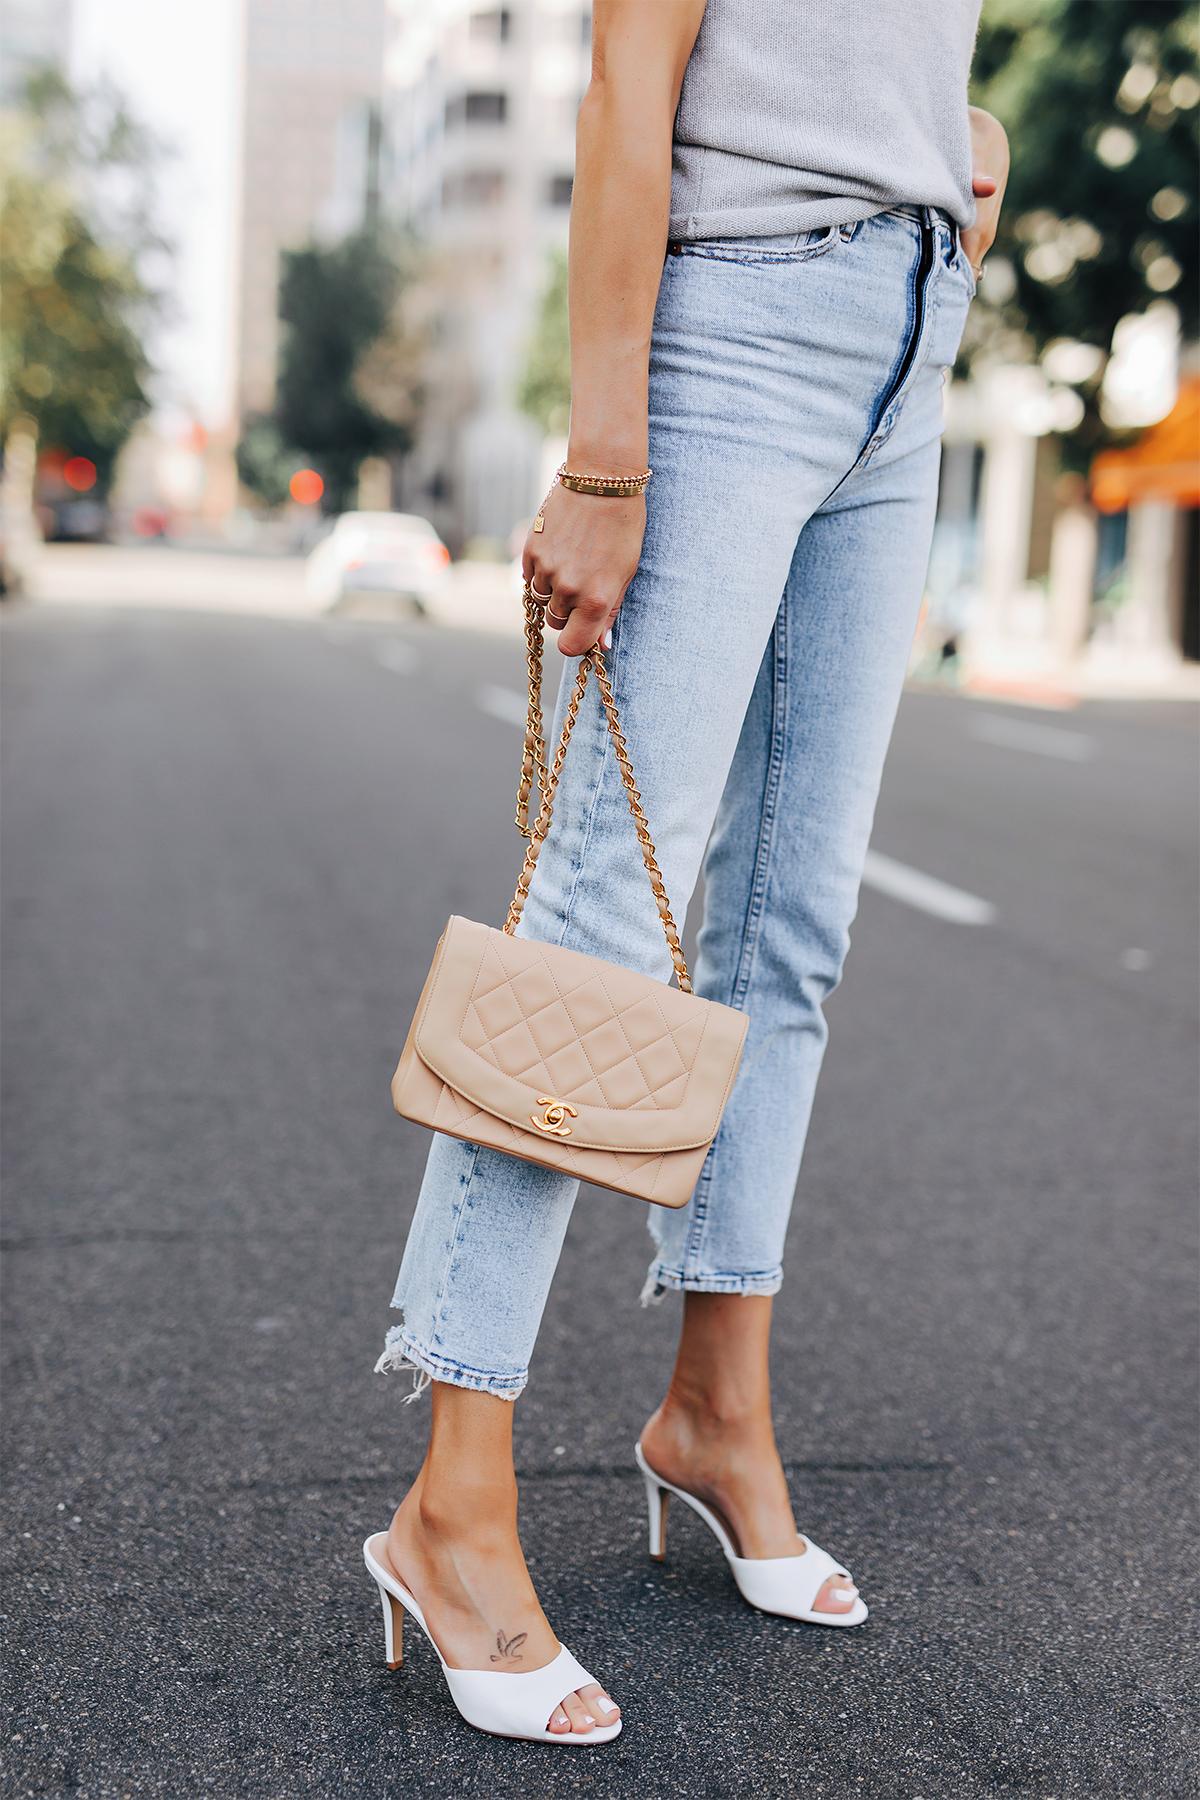 Fashion Jackson Wearing Abercrombie Straight Leg Jeans White Heels Chanel Beige Handbag